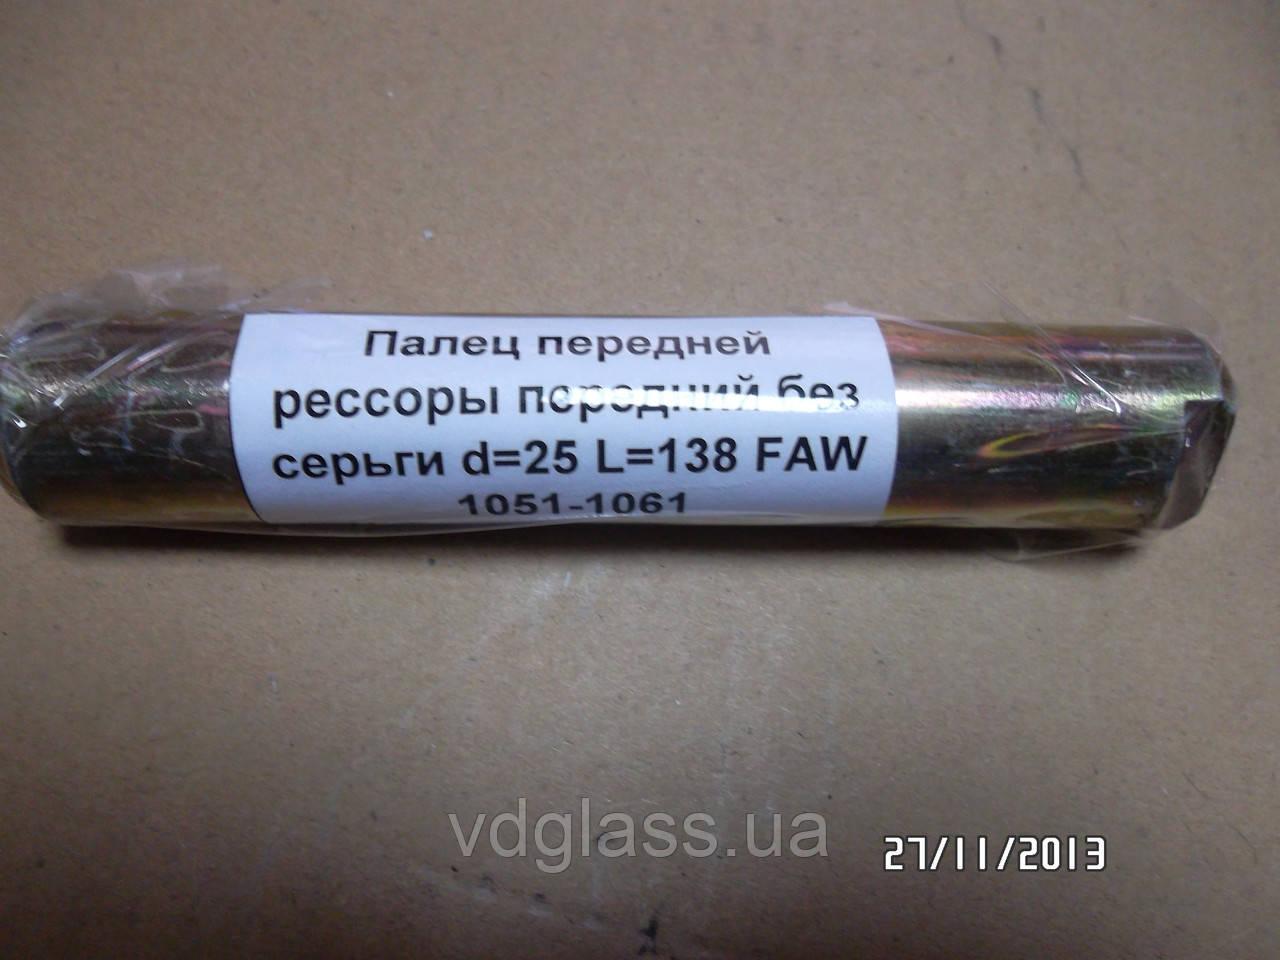 Палец передней рессоры передний без серьги FAW 1051,1061 d 25, L 138